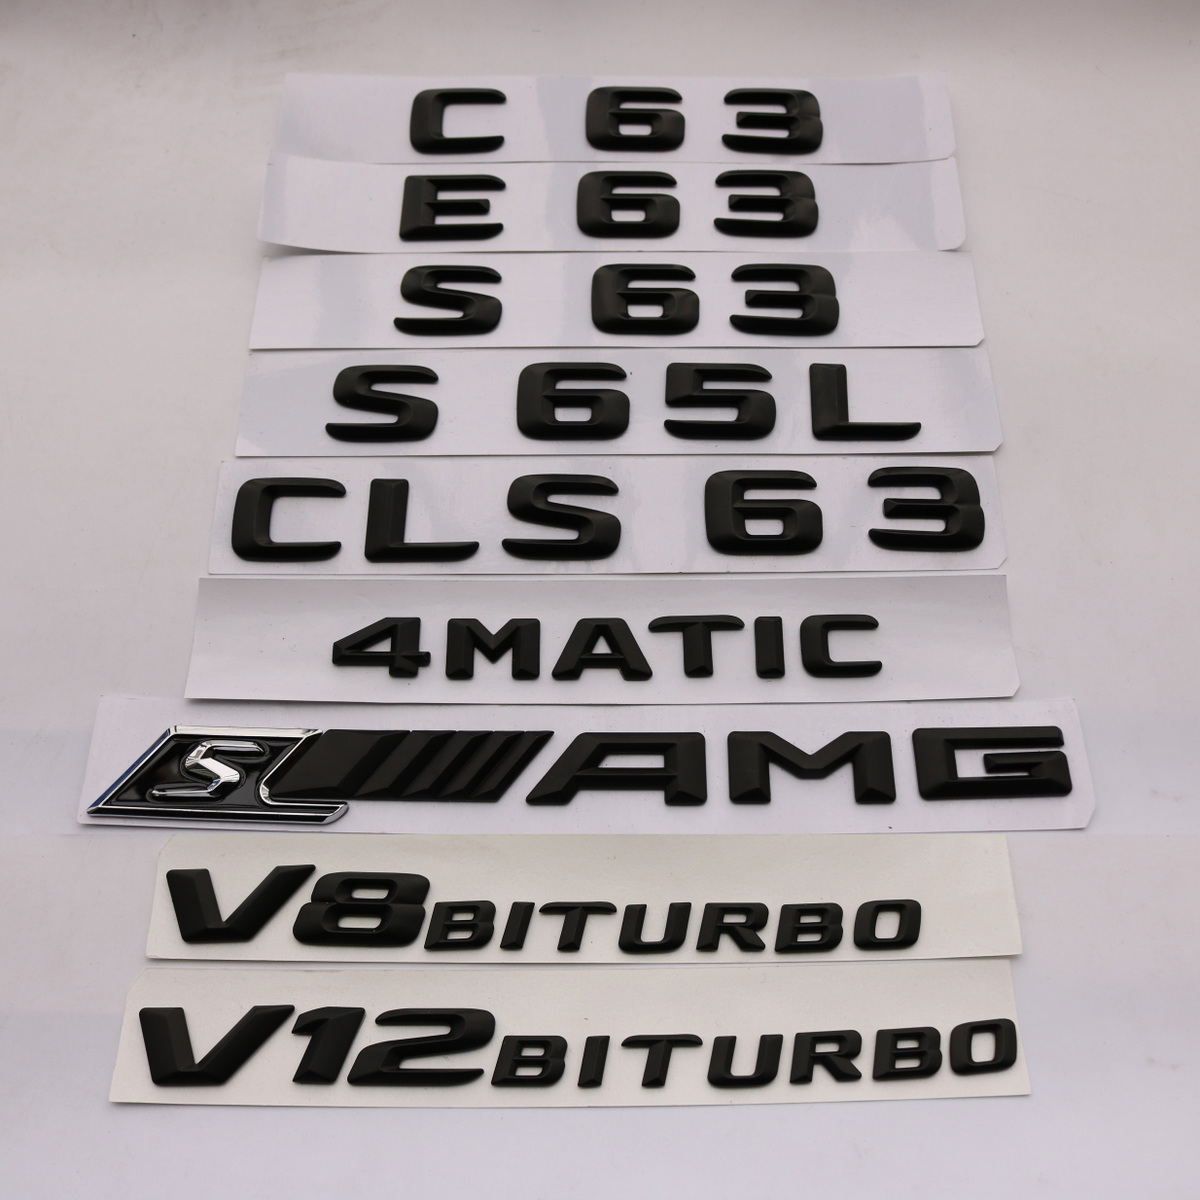 奔驰车标C63S A45 GLA45 CLA45 CLS63 E63 S AMG字标后尾标志黑色